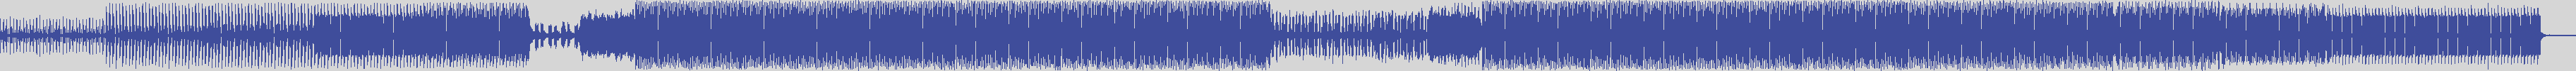 just_digital_records [JS1143] Homeboyz - Psyco [Jumping Mix] audio wave form